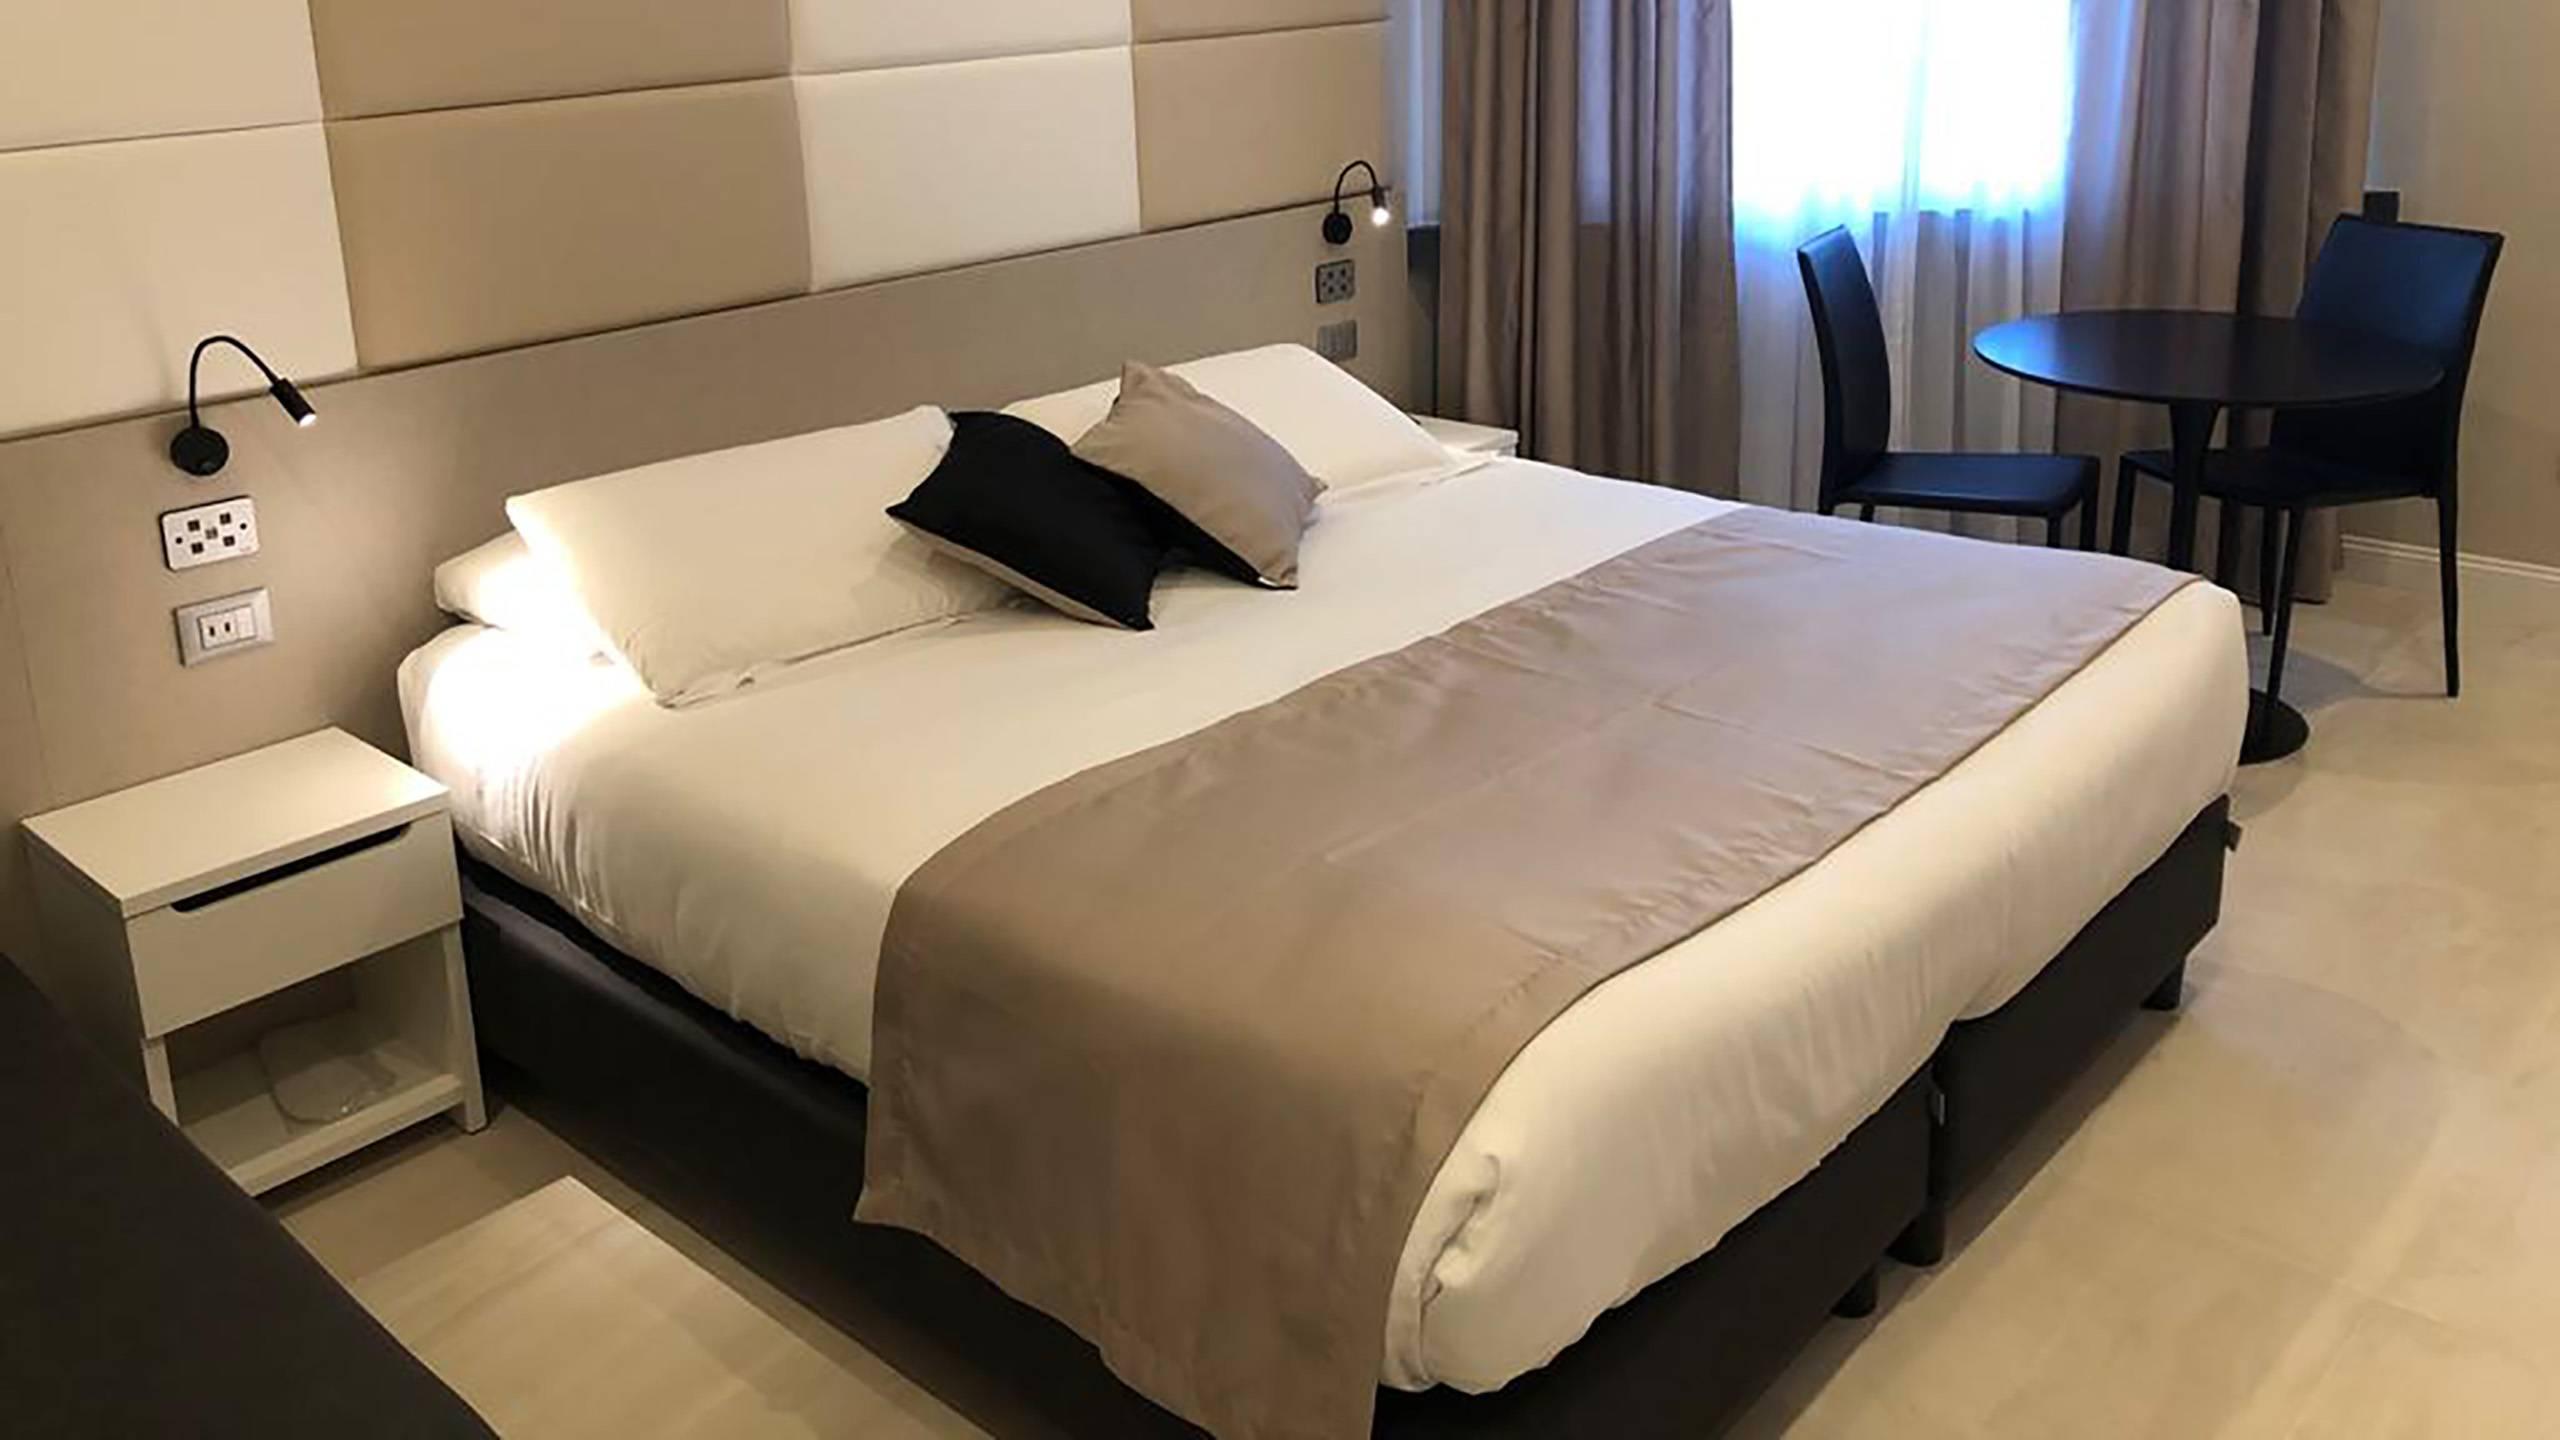 Hotel-Eurogarden-Roma-foto-2020-PHOTO-2020-10-05-18-22-22-3